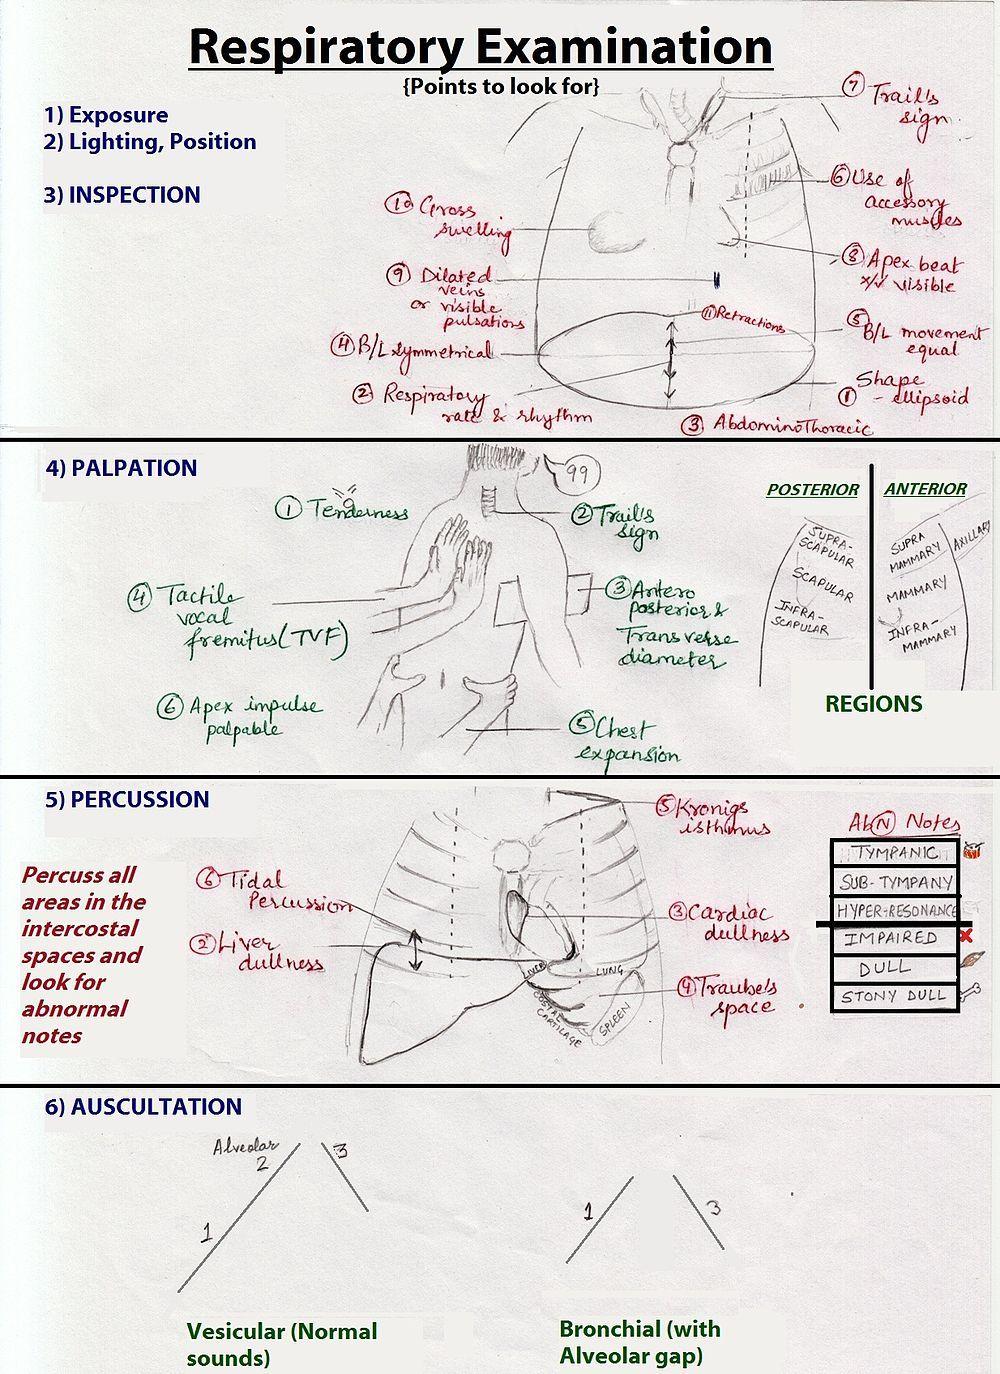 Respiratory examination Wikipedia, the free encyclopedia